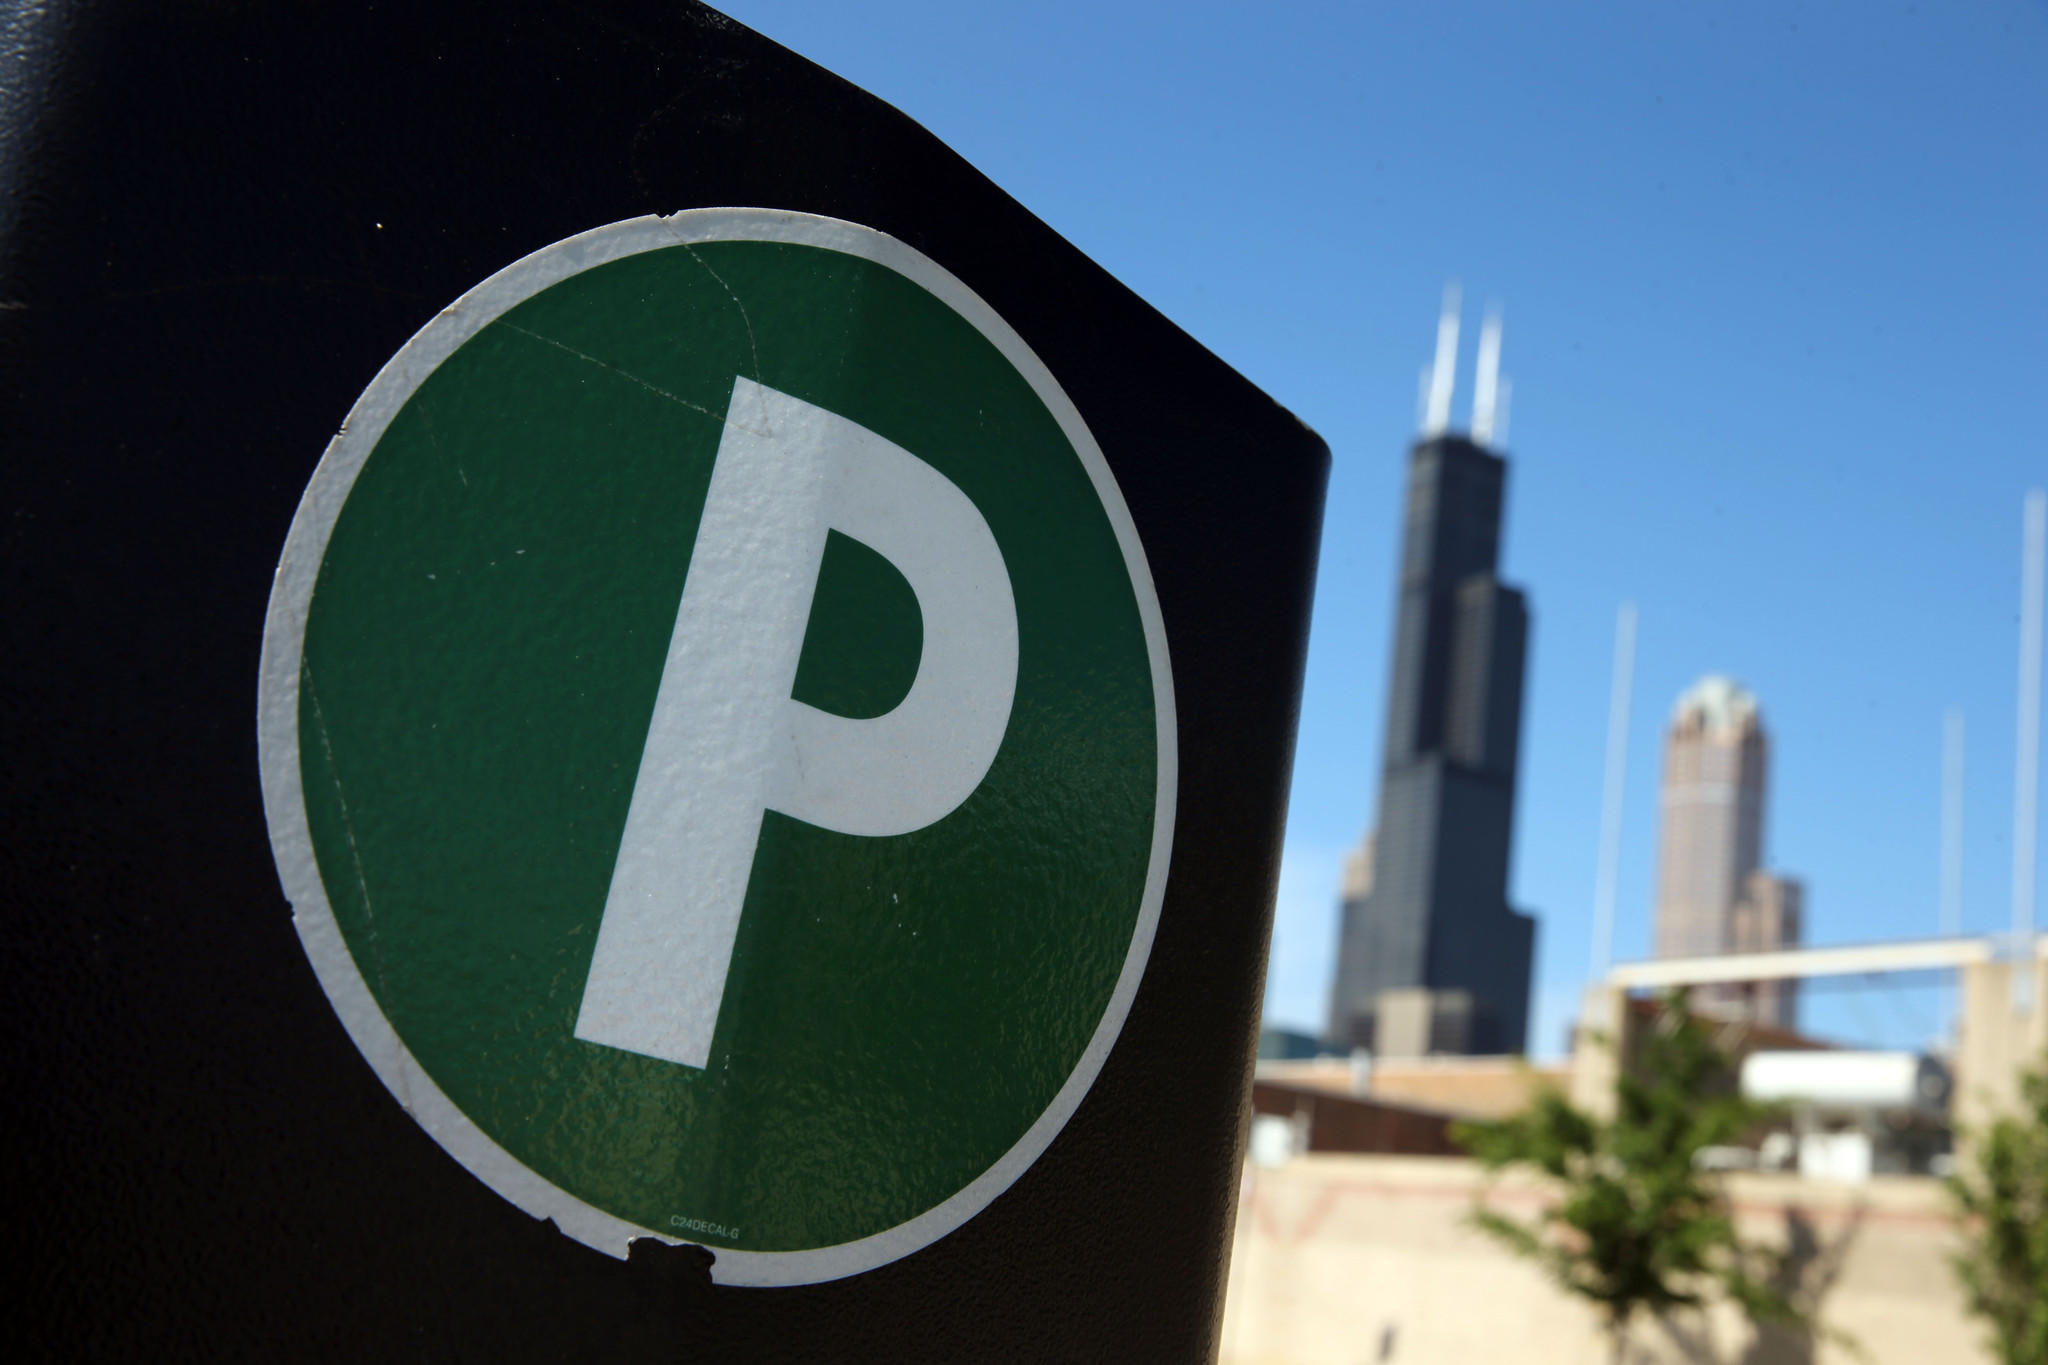 A parking meter on Des Plaines Avenue near Taylor Street on June 3, 2013.